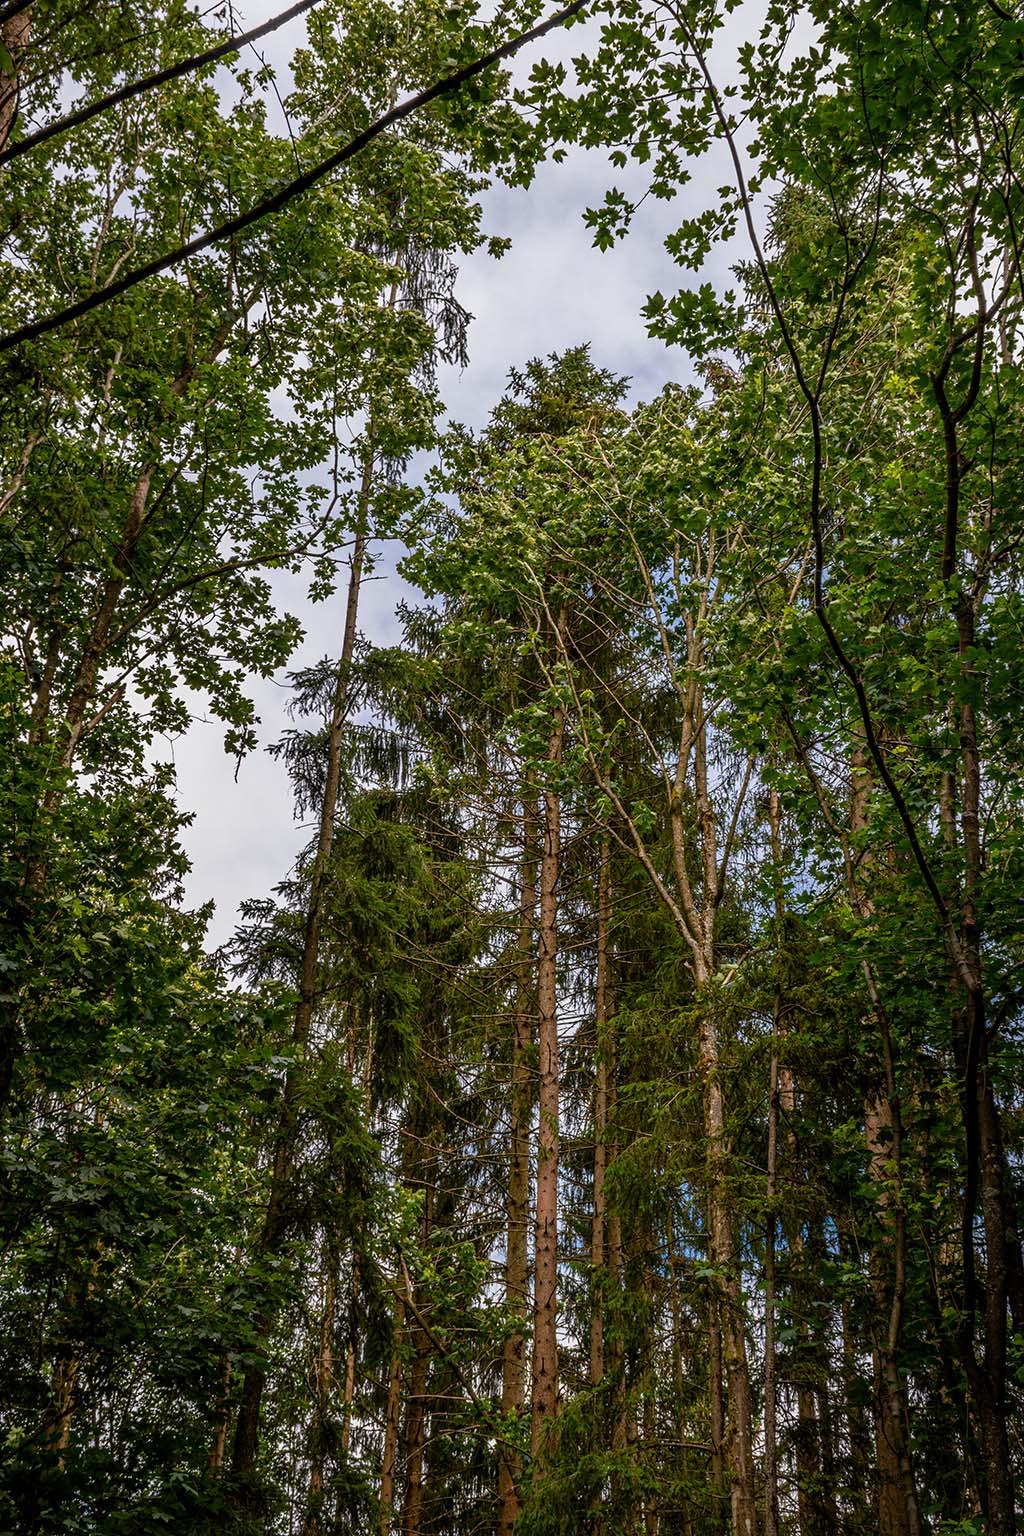 Tanzende Bäume im Wald